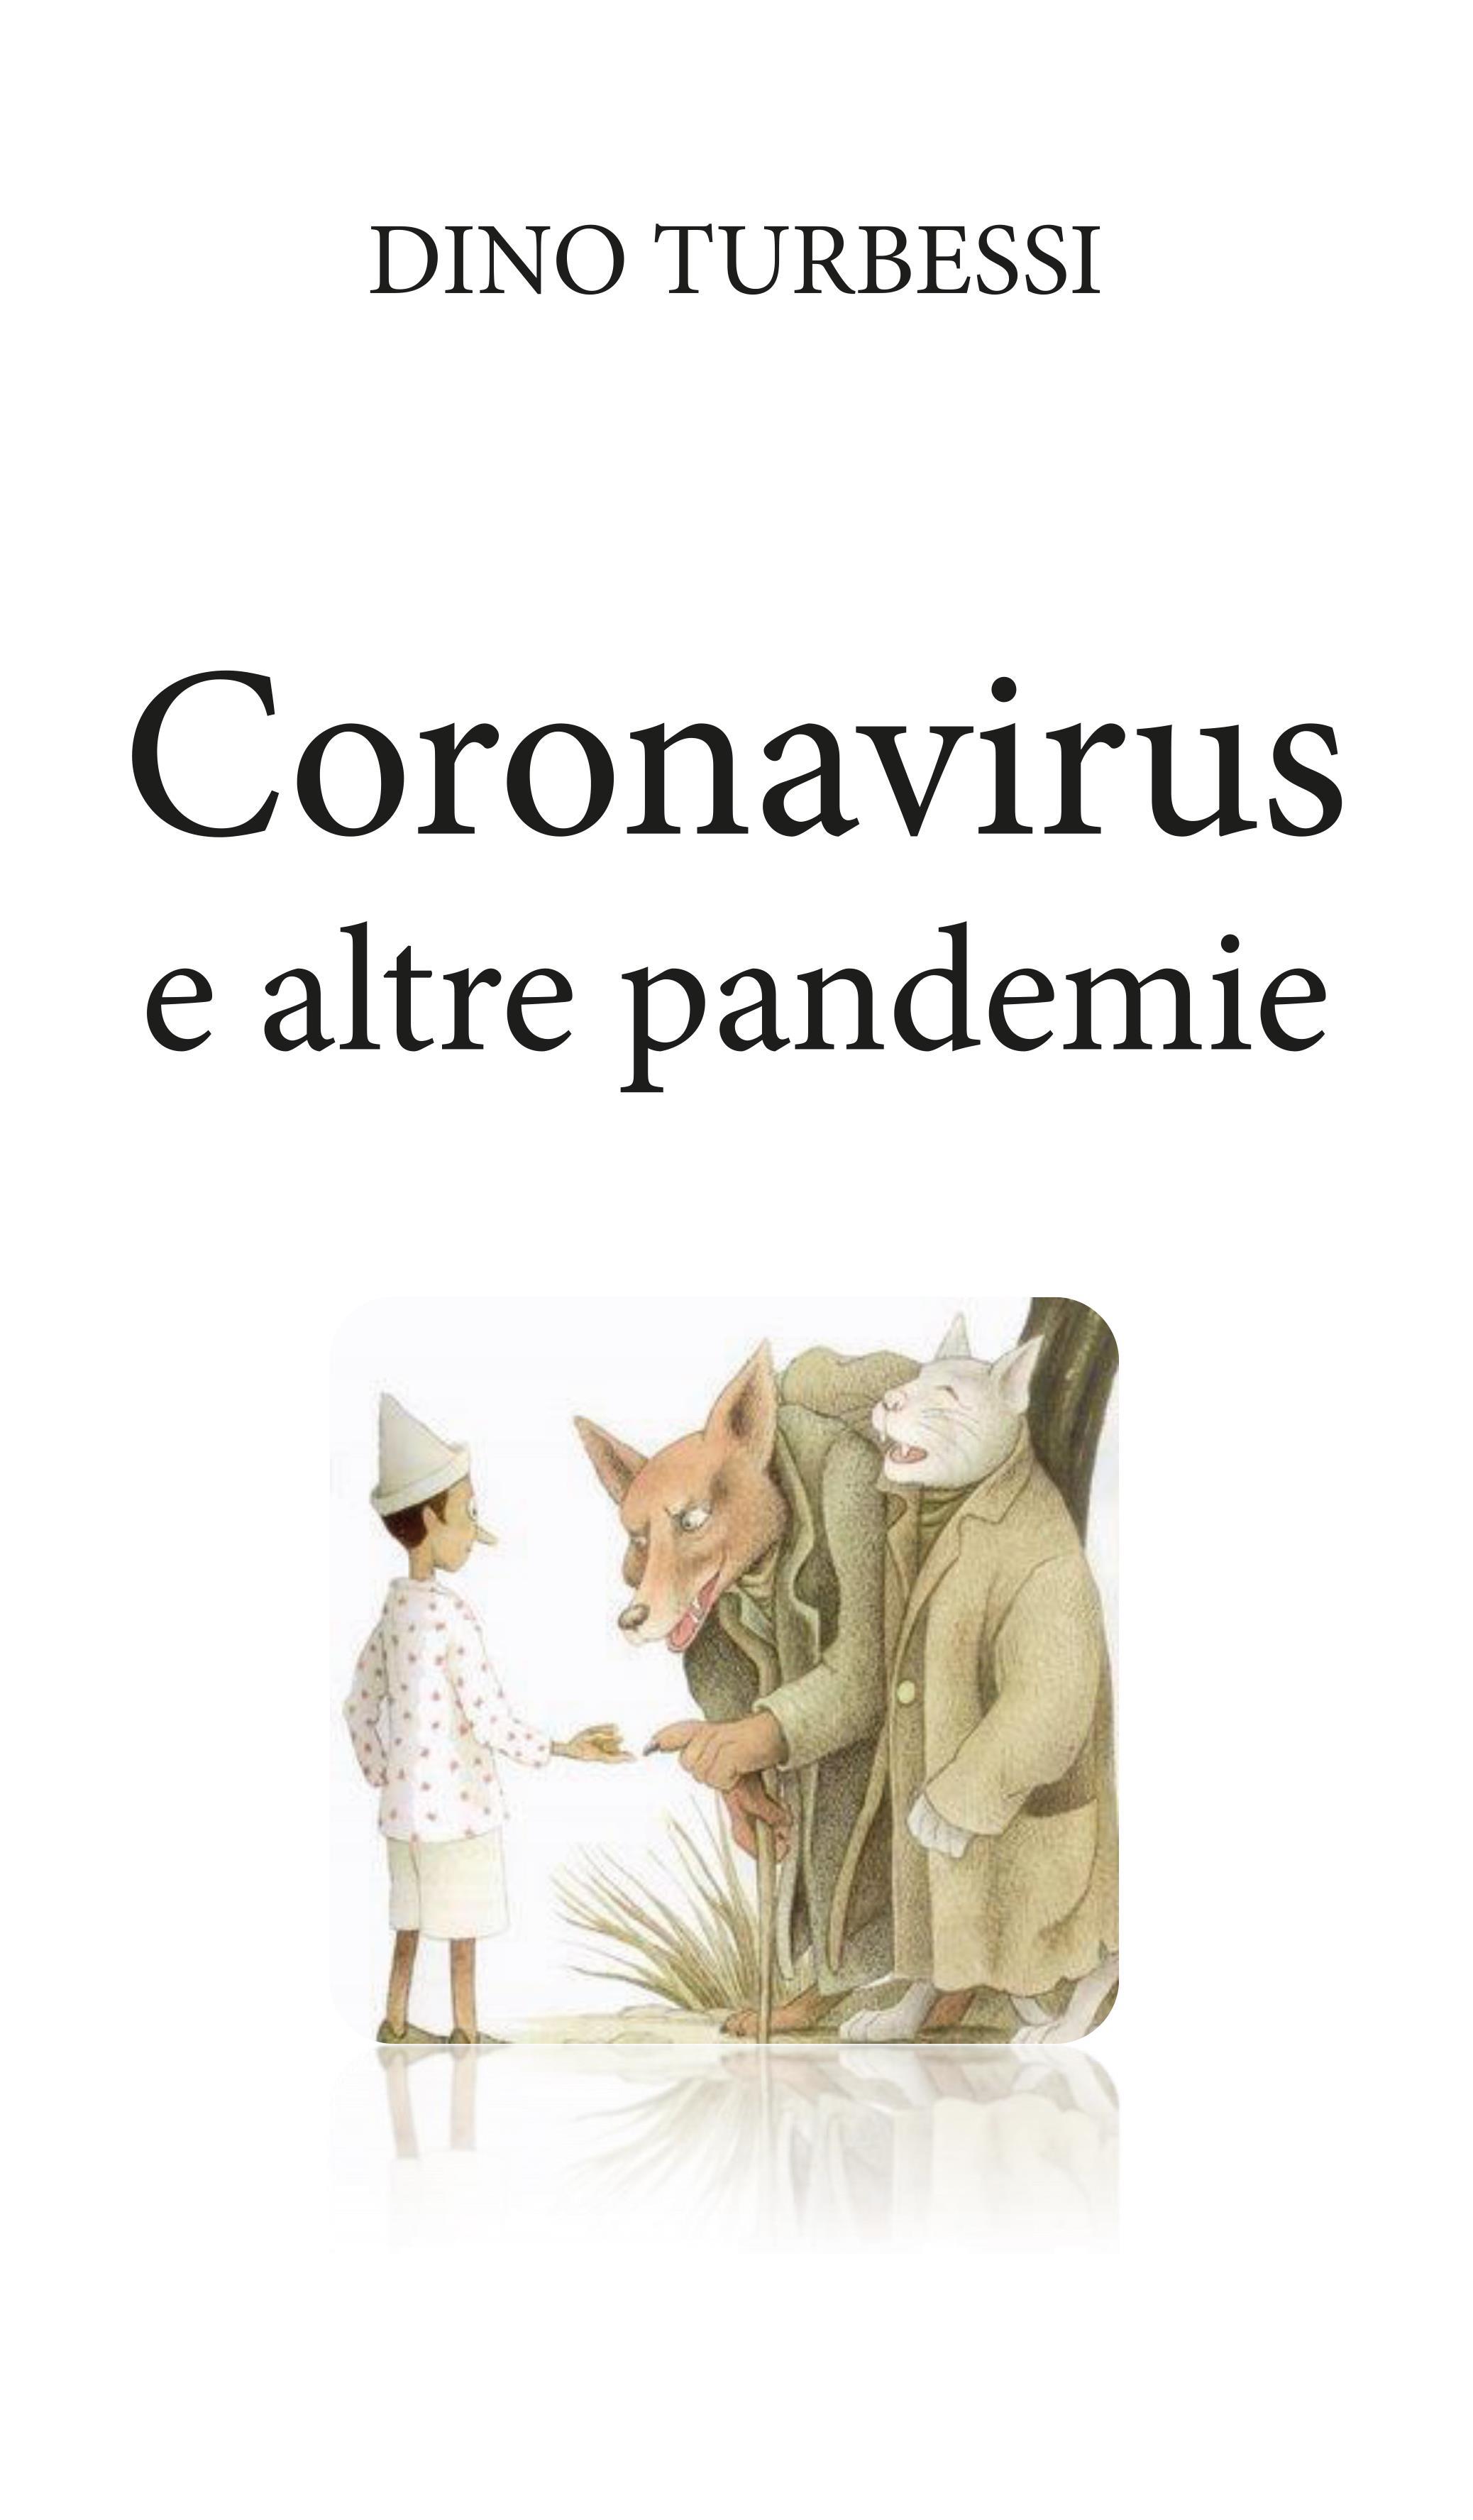 Coronavirus e altre pandemie